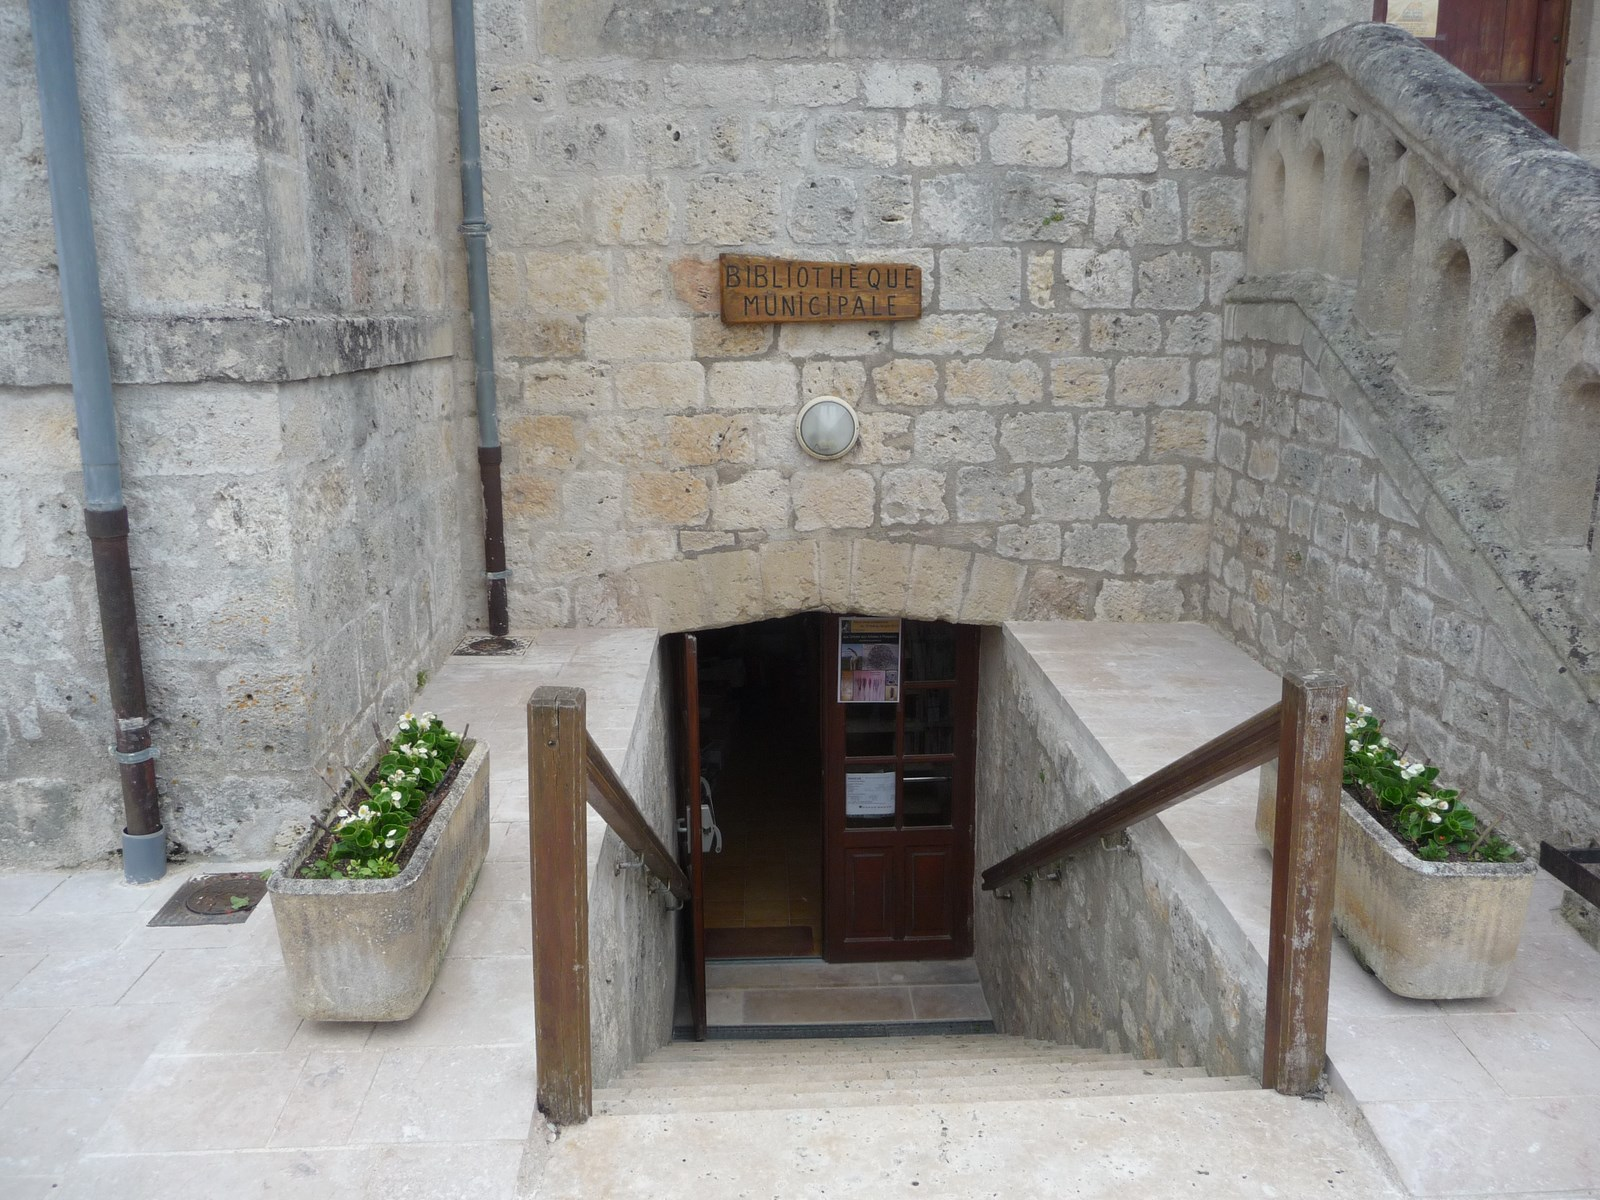 Roquecor bibliothèque municipale